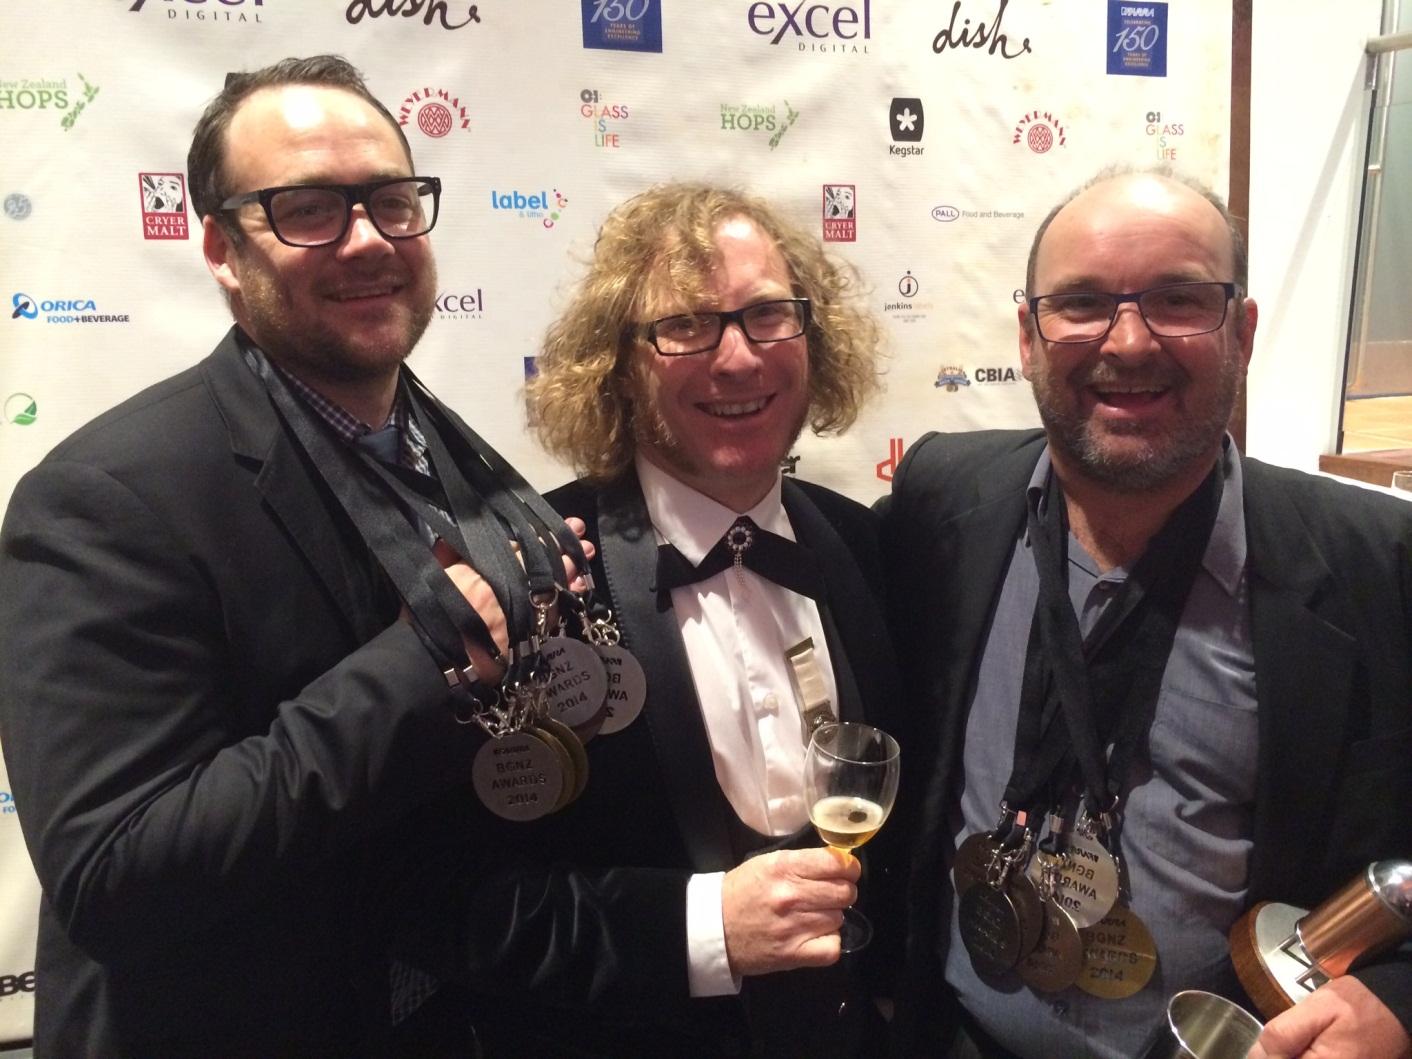 L - R: Gareth Hughes (Moa General Manager), Te Radar (MC), David Nicholls (Moa Head Brewer)